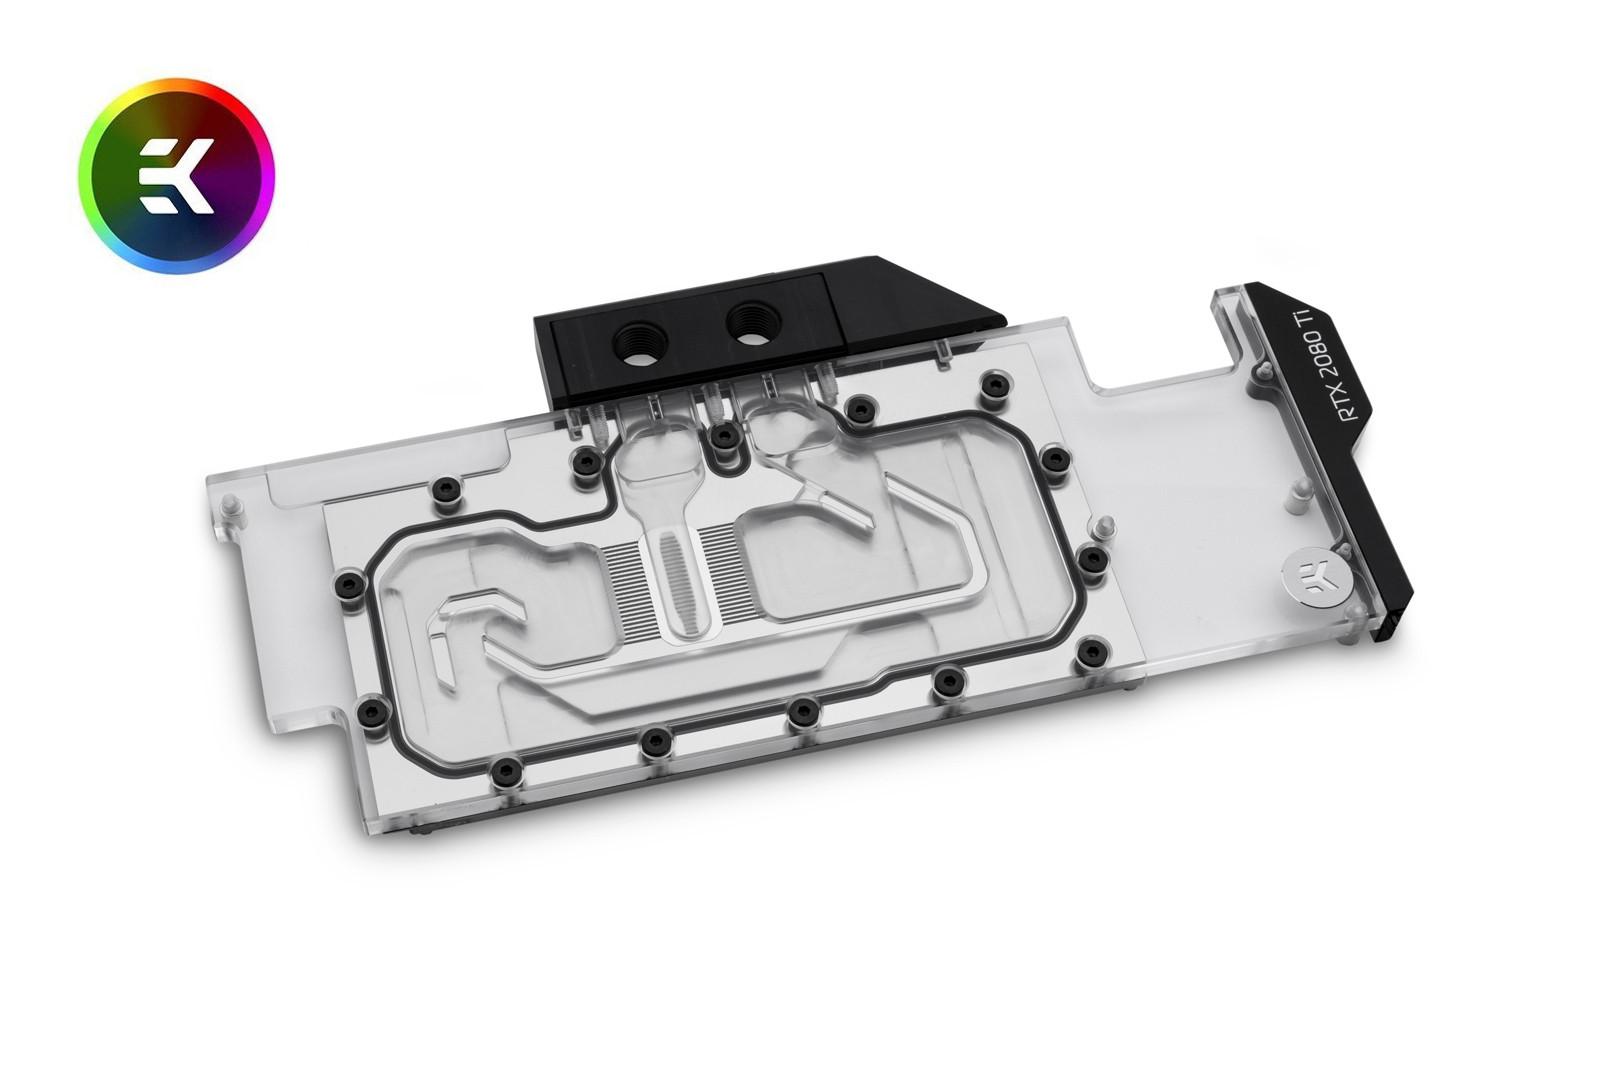 List of compatible water blocks | NVIDIA Titan RTX, 24GB